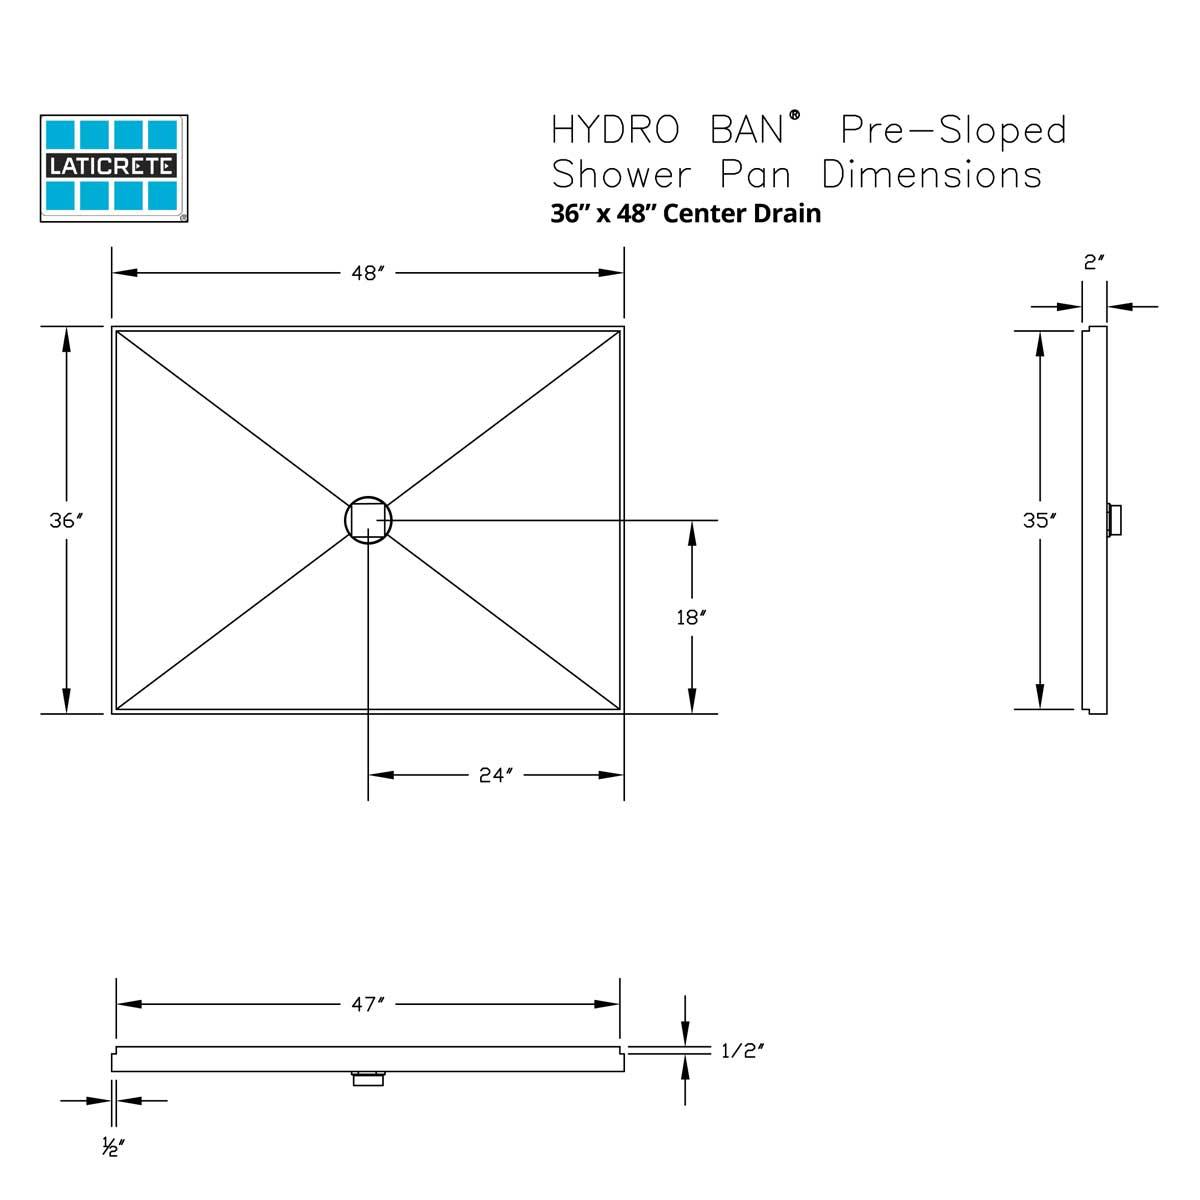 ... 9352 3648 PVC Center Drain 36 X 48in Hydro Ban Pre Sloped Shower ...